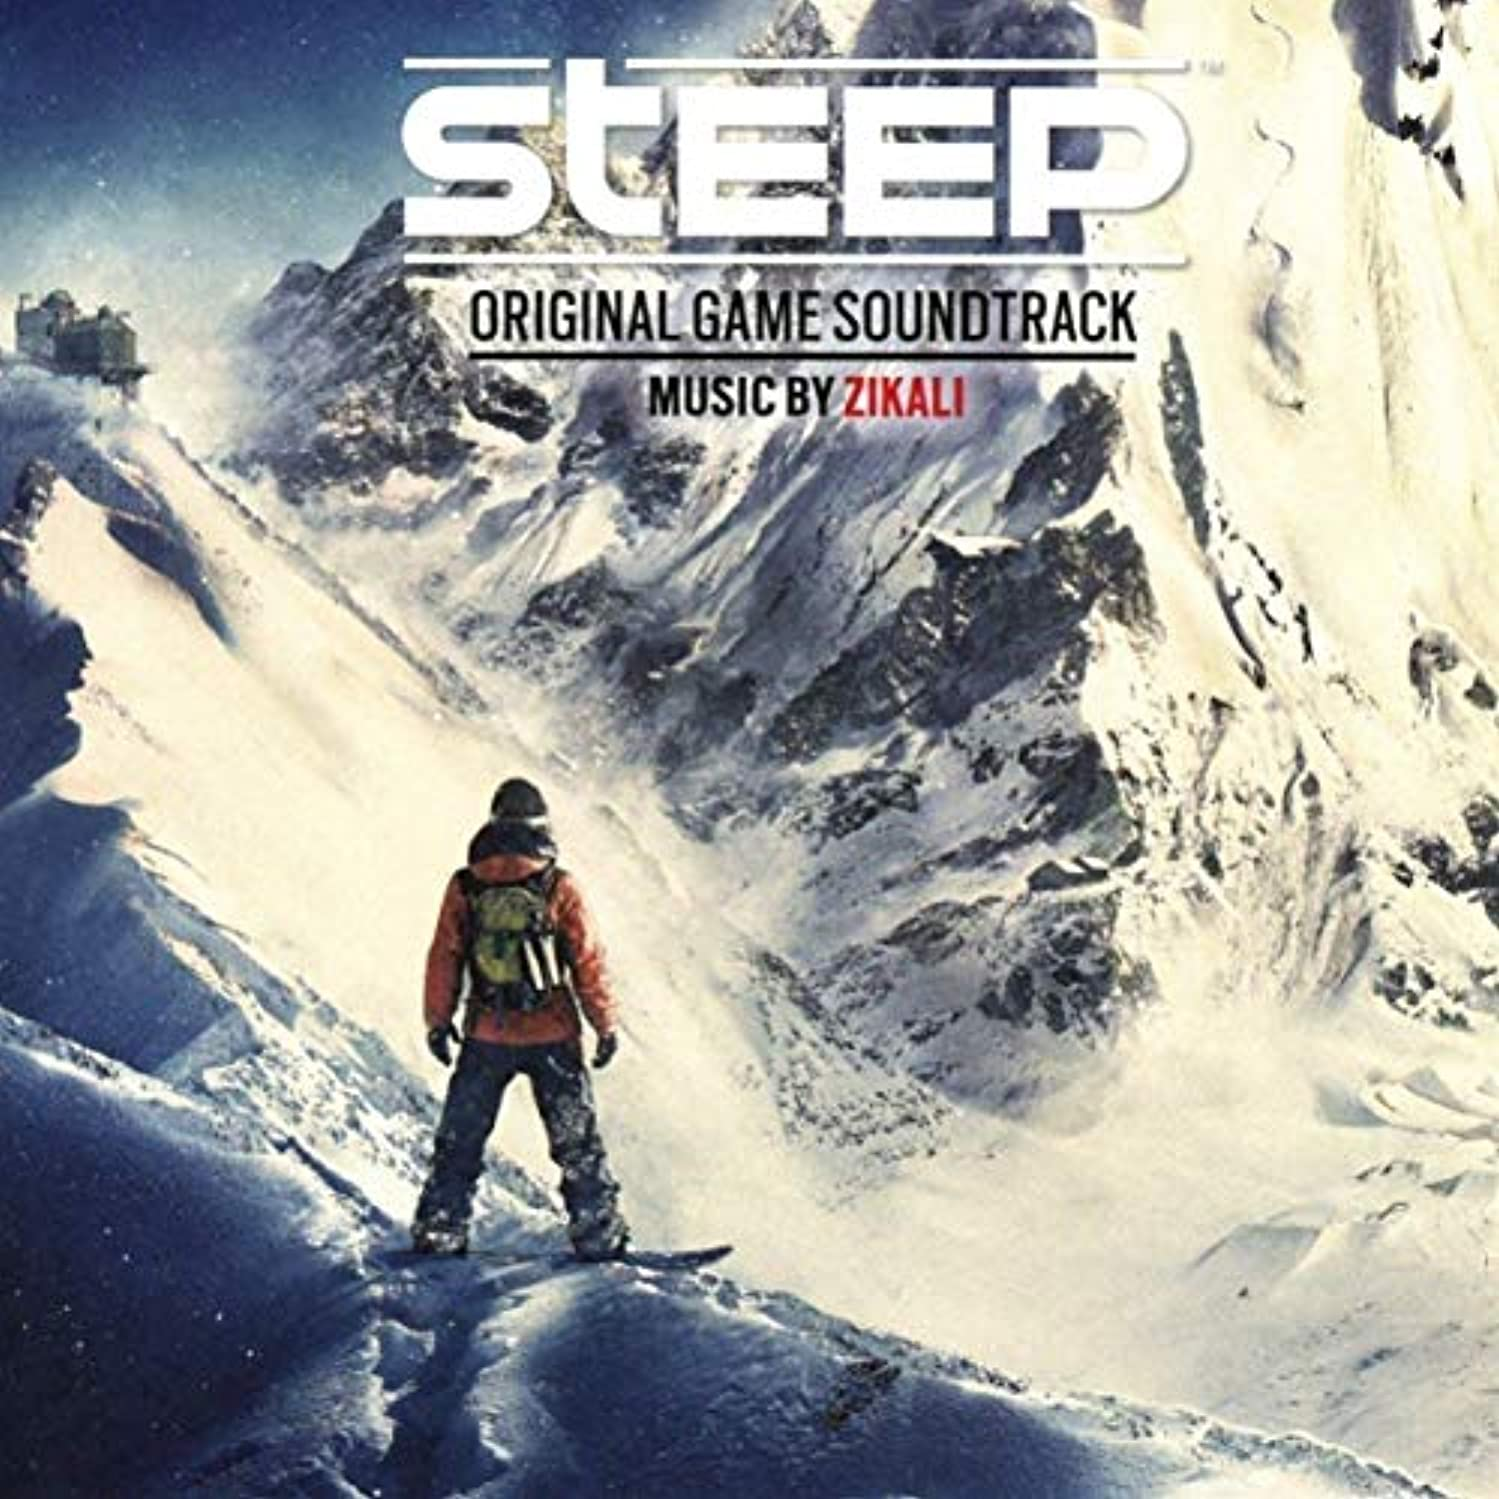 Steep - Original Game Soundtrack